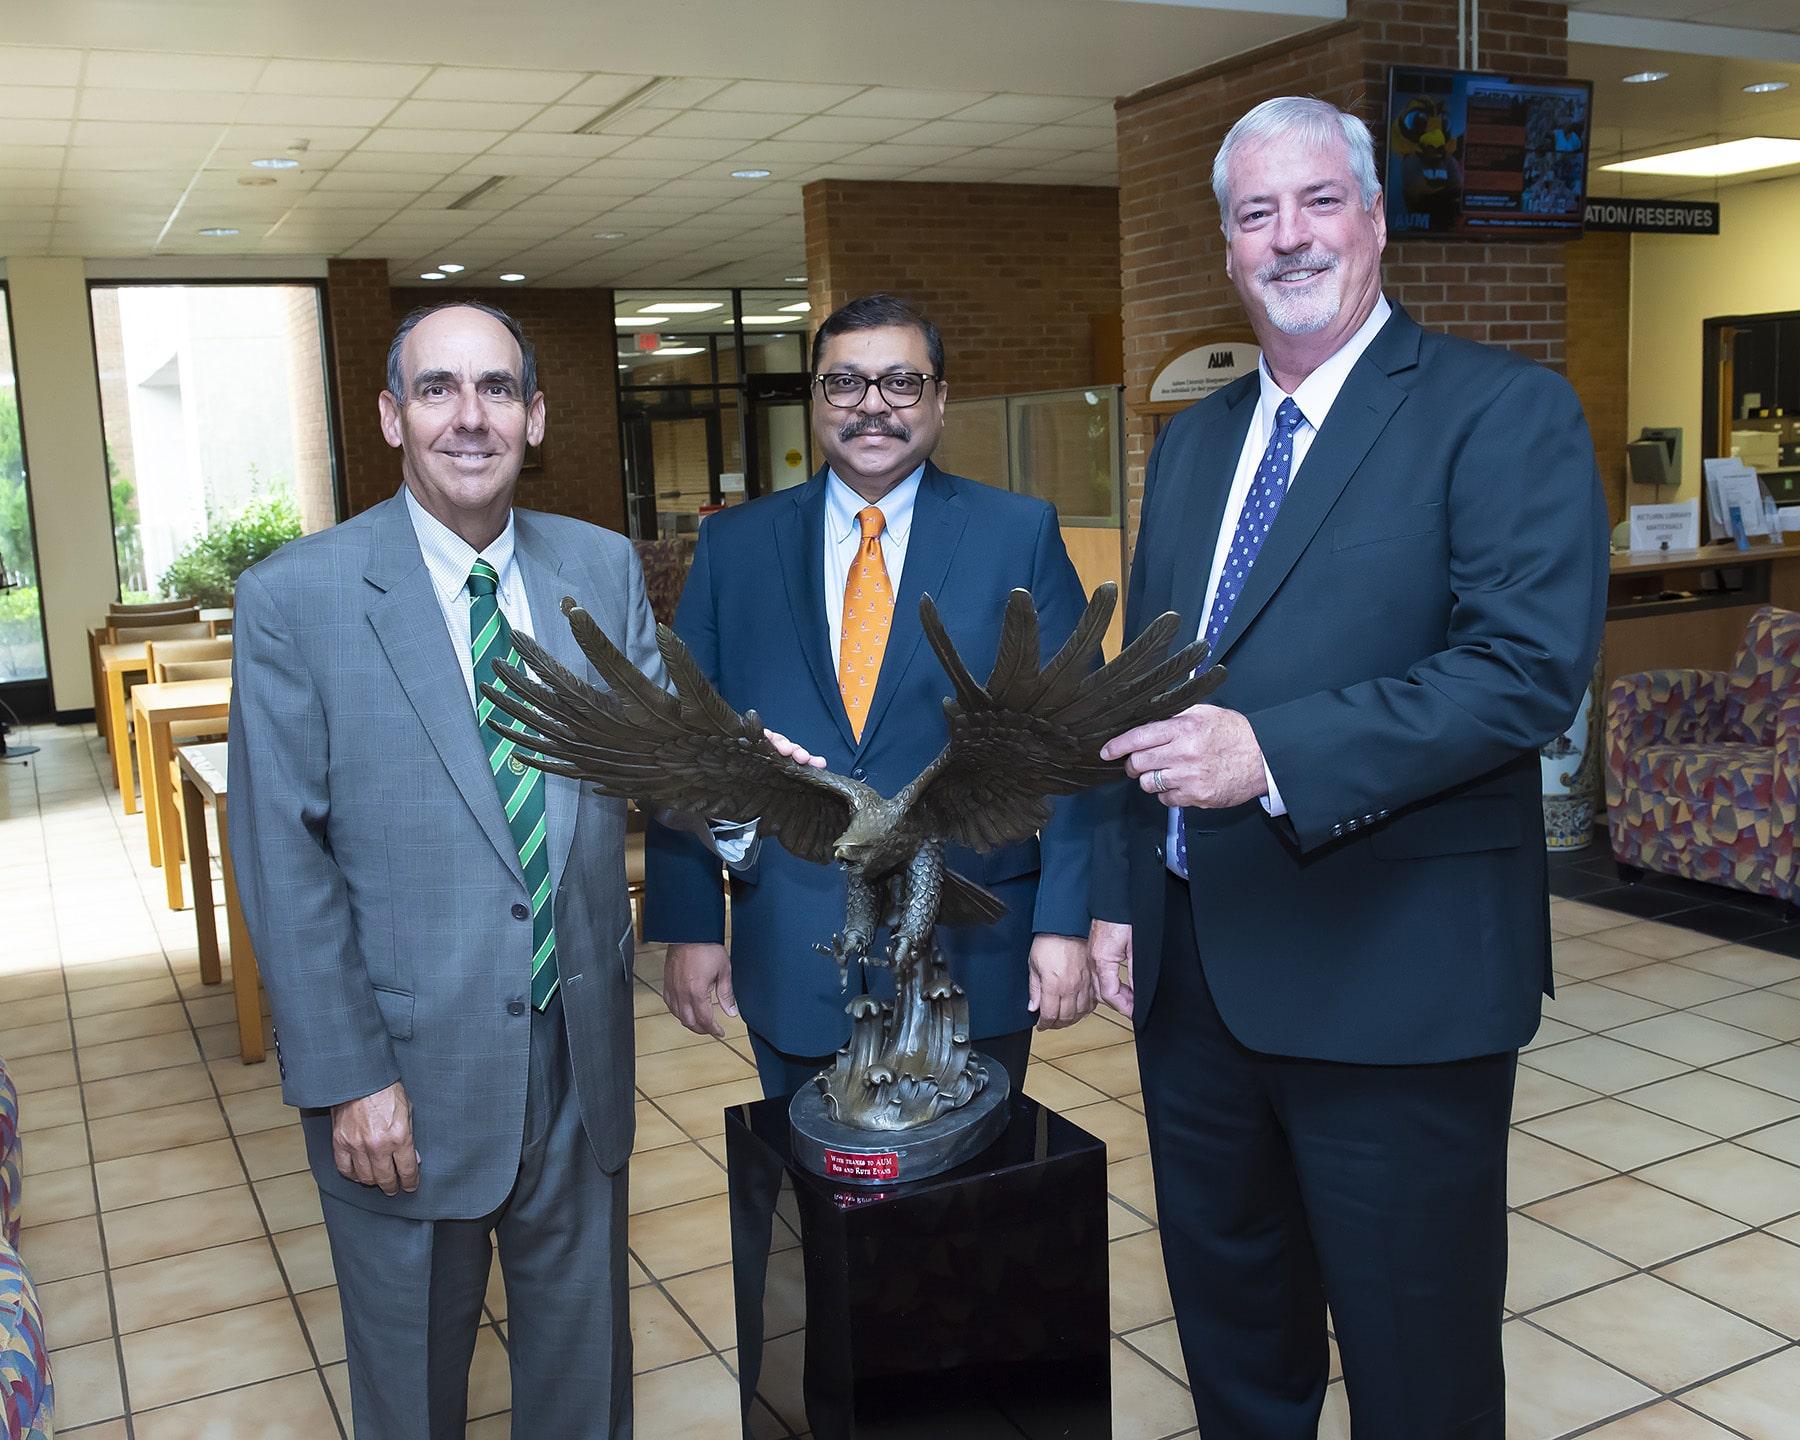 Retired professor gifts Warhawk statue to AUM